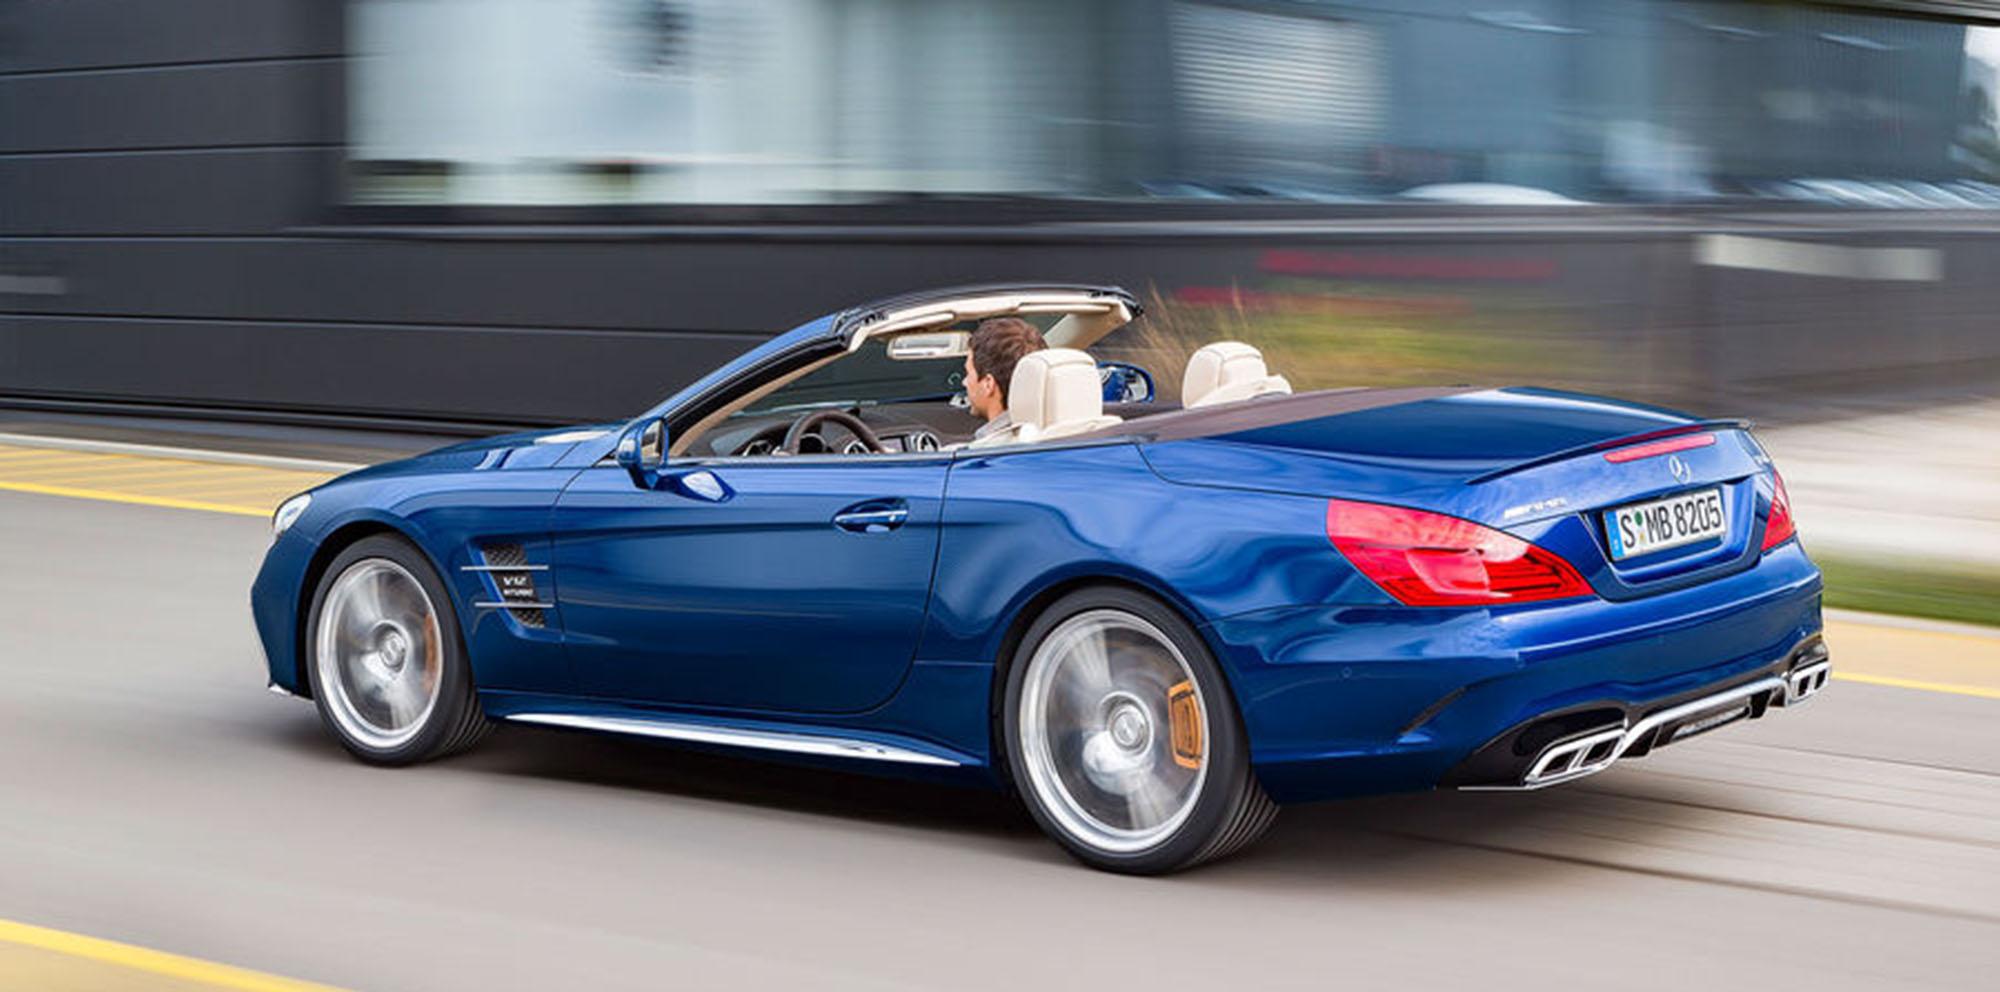 2016 mercedes benz sl facelift leaked online photos 1 of 9 for Mercedes benz online